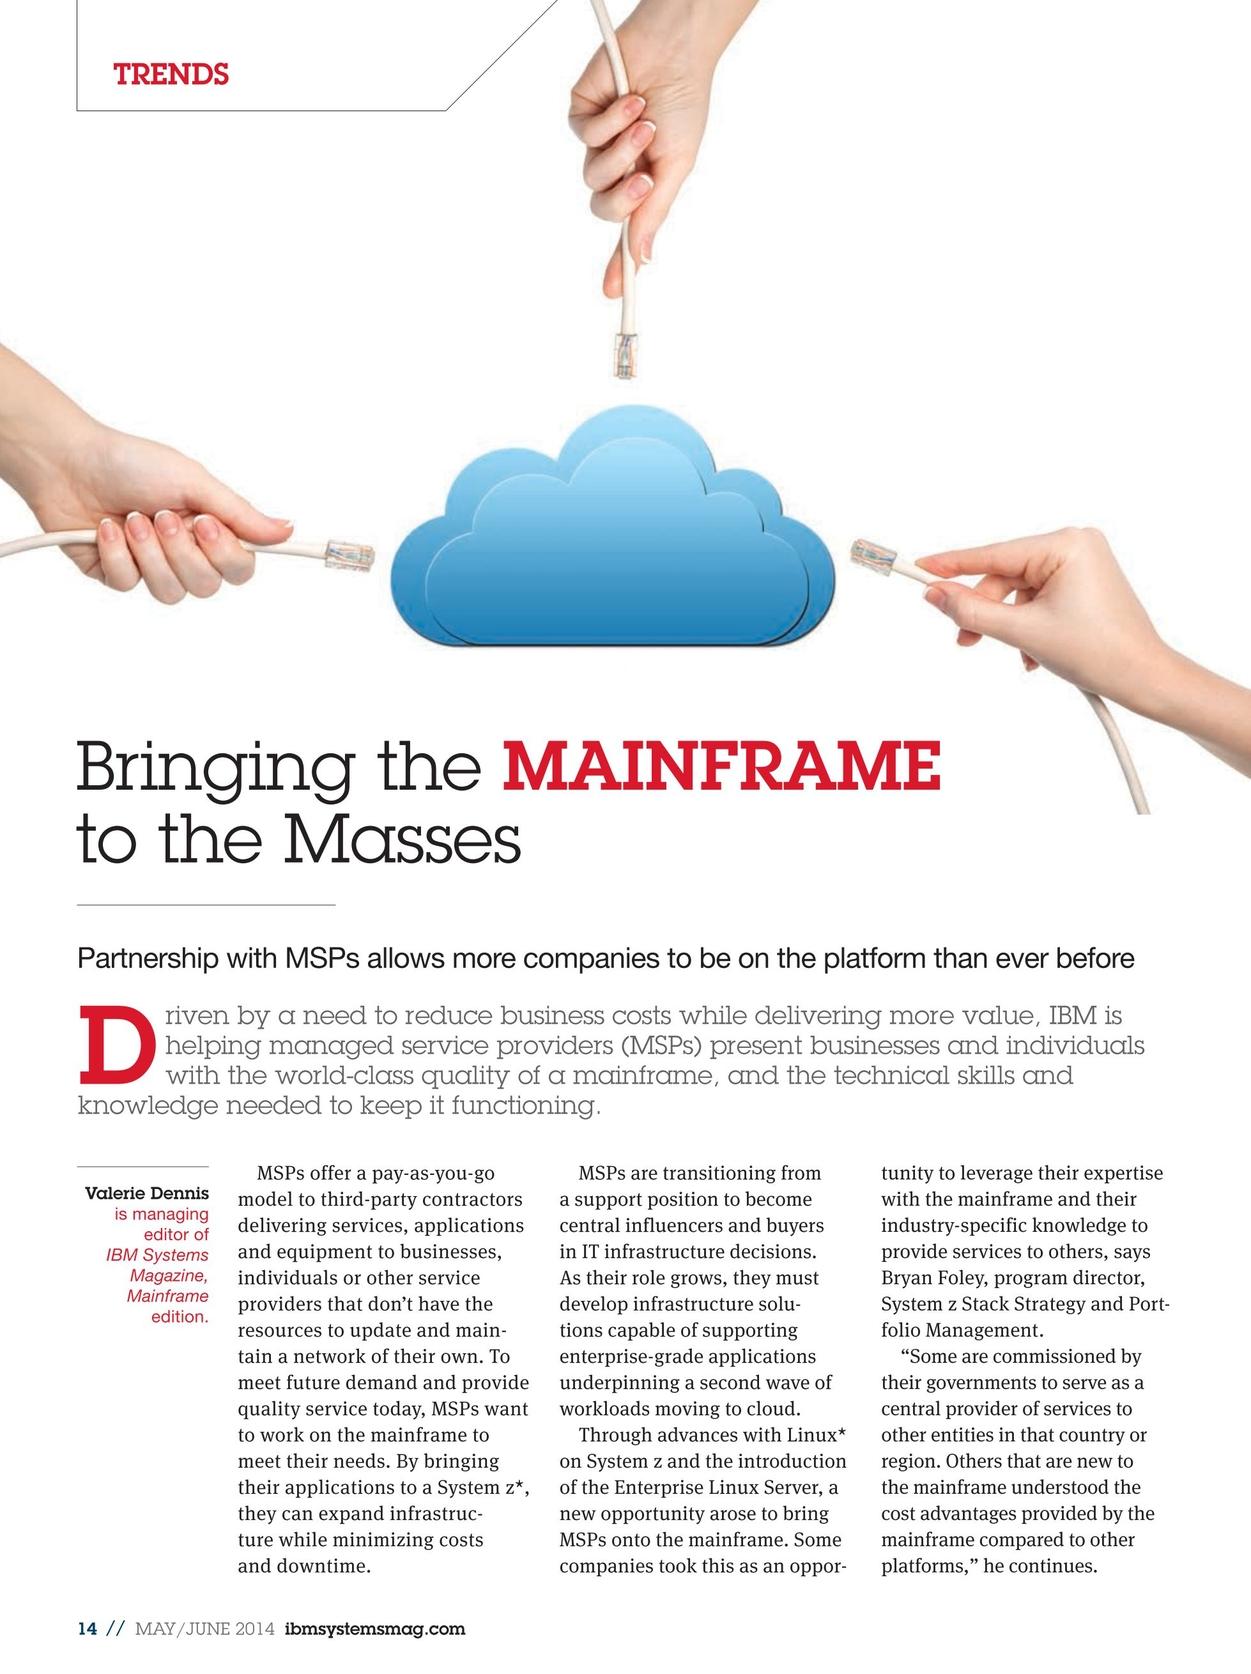 IBM Systems Magazine, Mainframe - May/June 2014